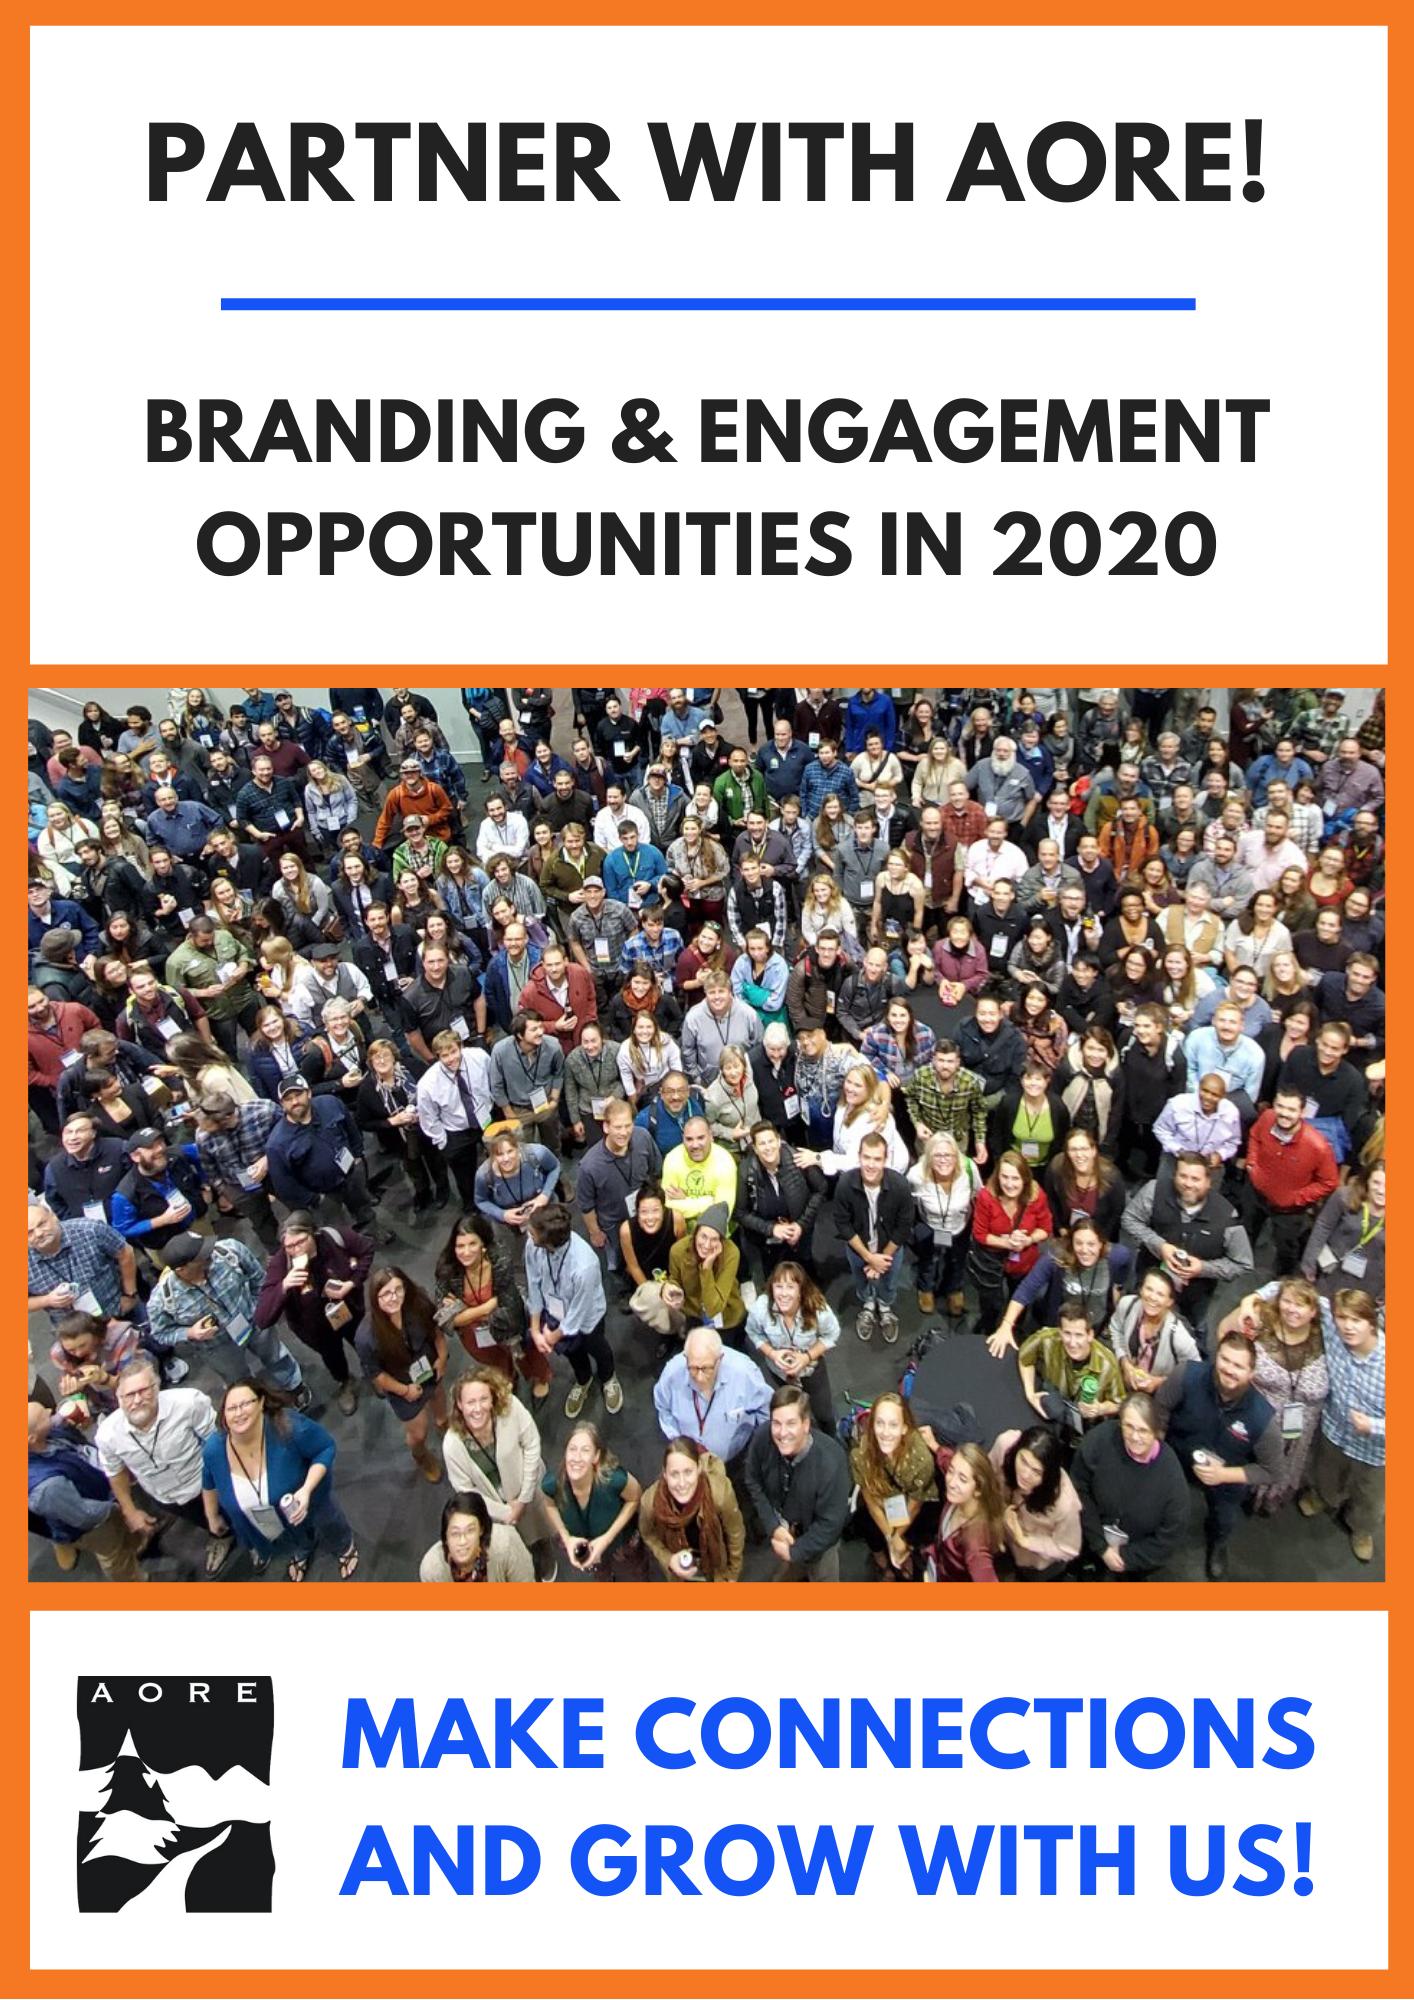 AORE BRANDING & ENGAGEMENT OPPORTUNITIES 2020